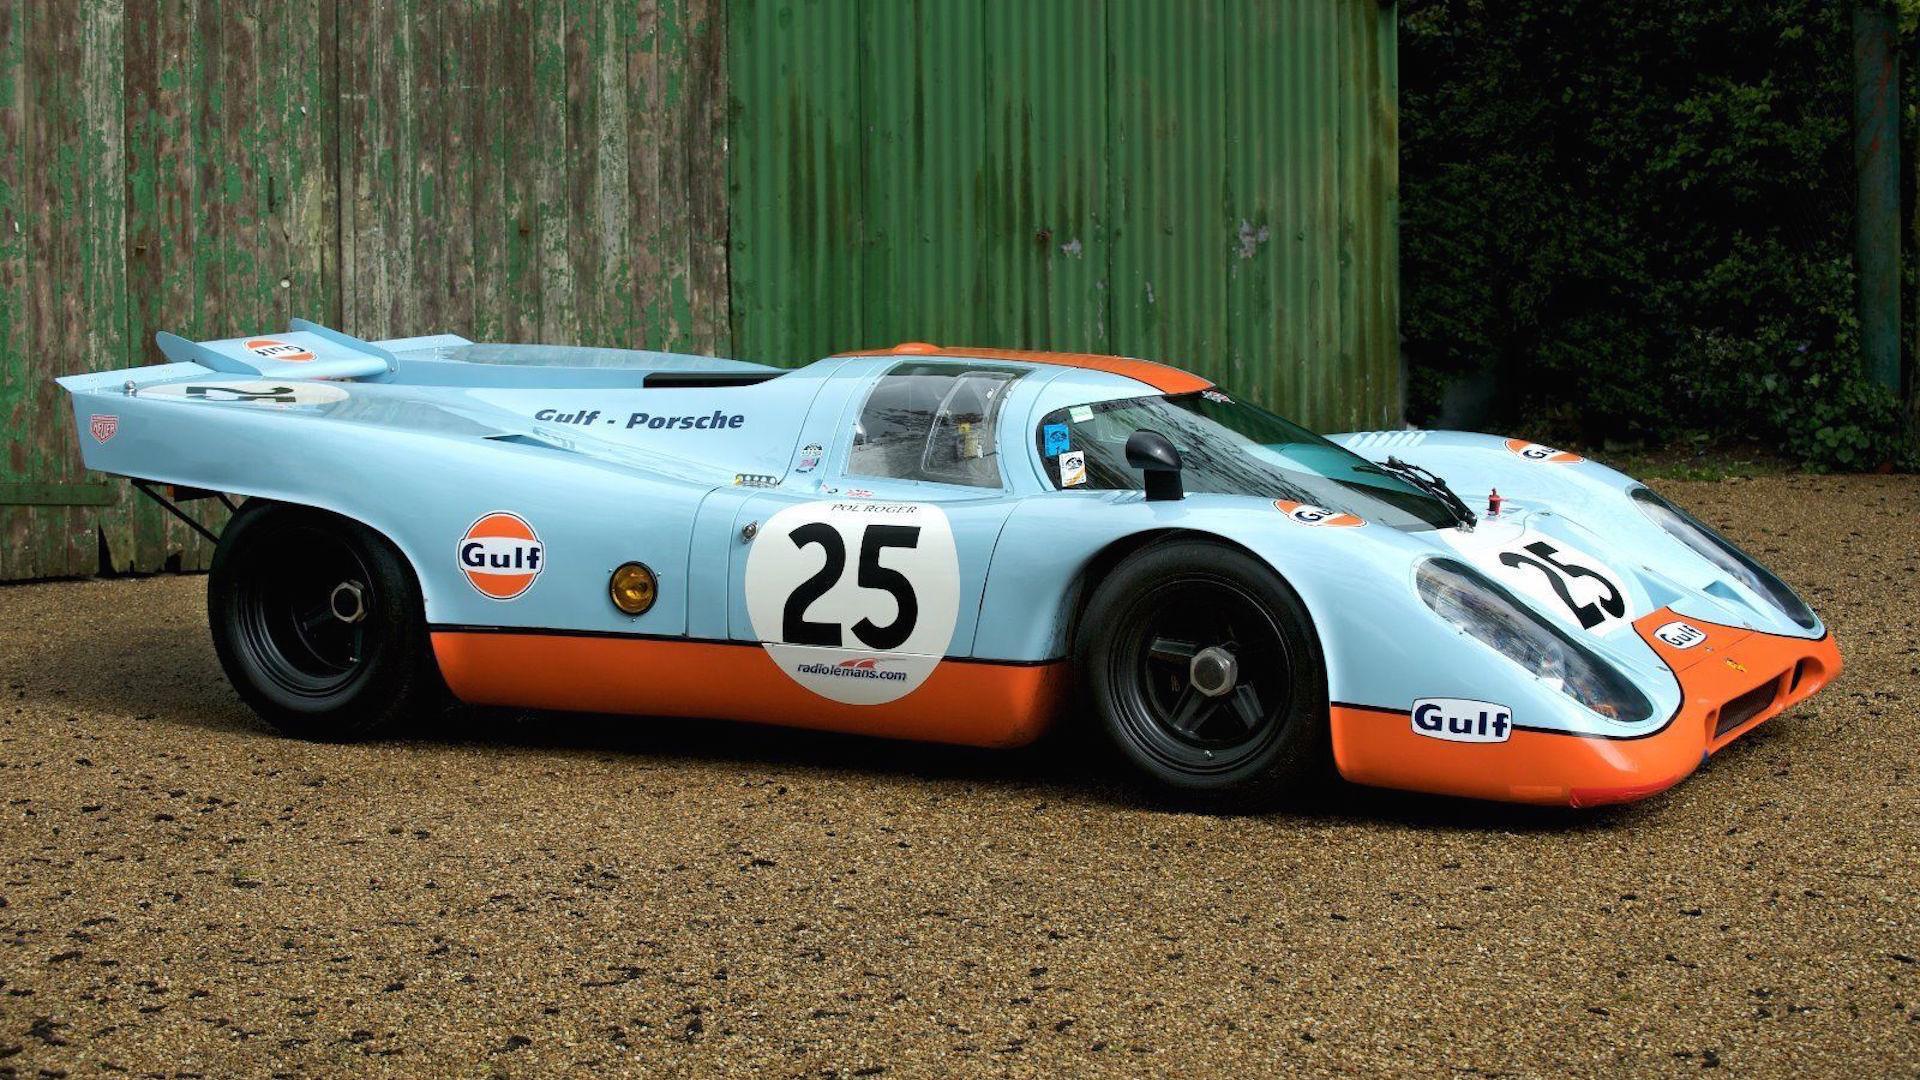 Porsche 917 For Sale >> Porsche 917 Replica Will Let You Live Out Your Le Mans Fantasies